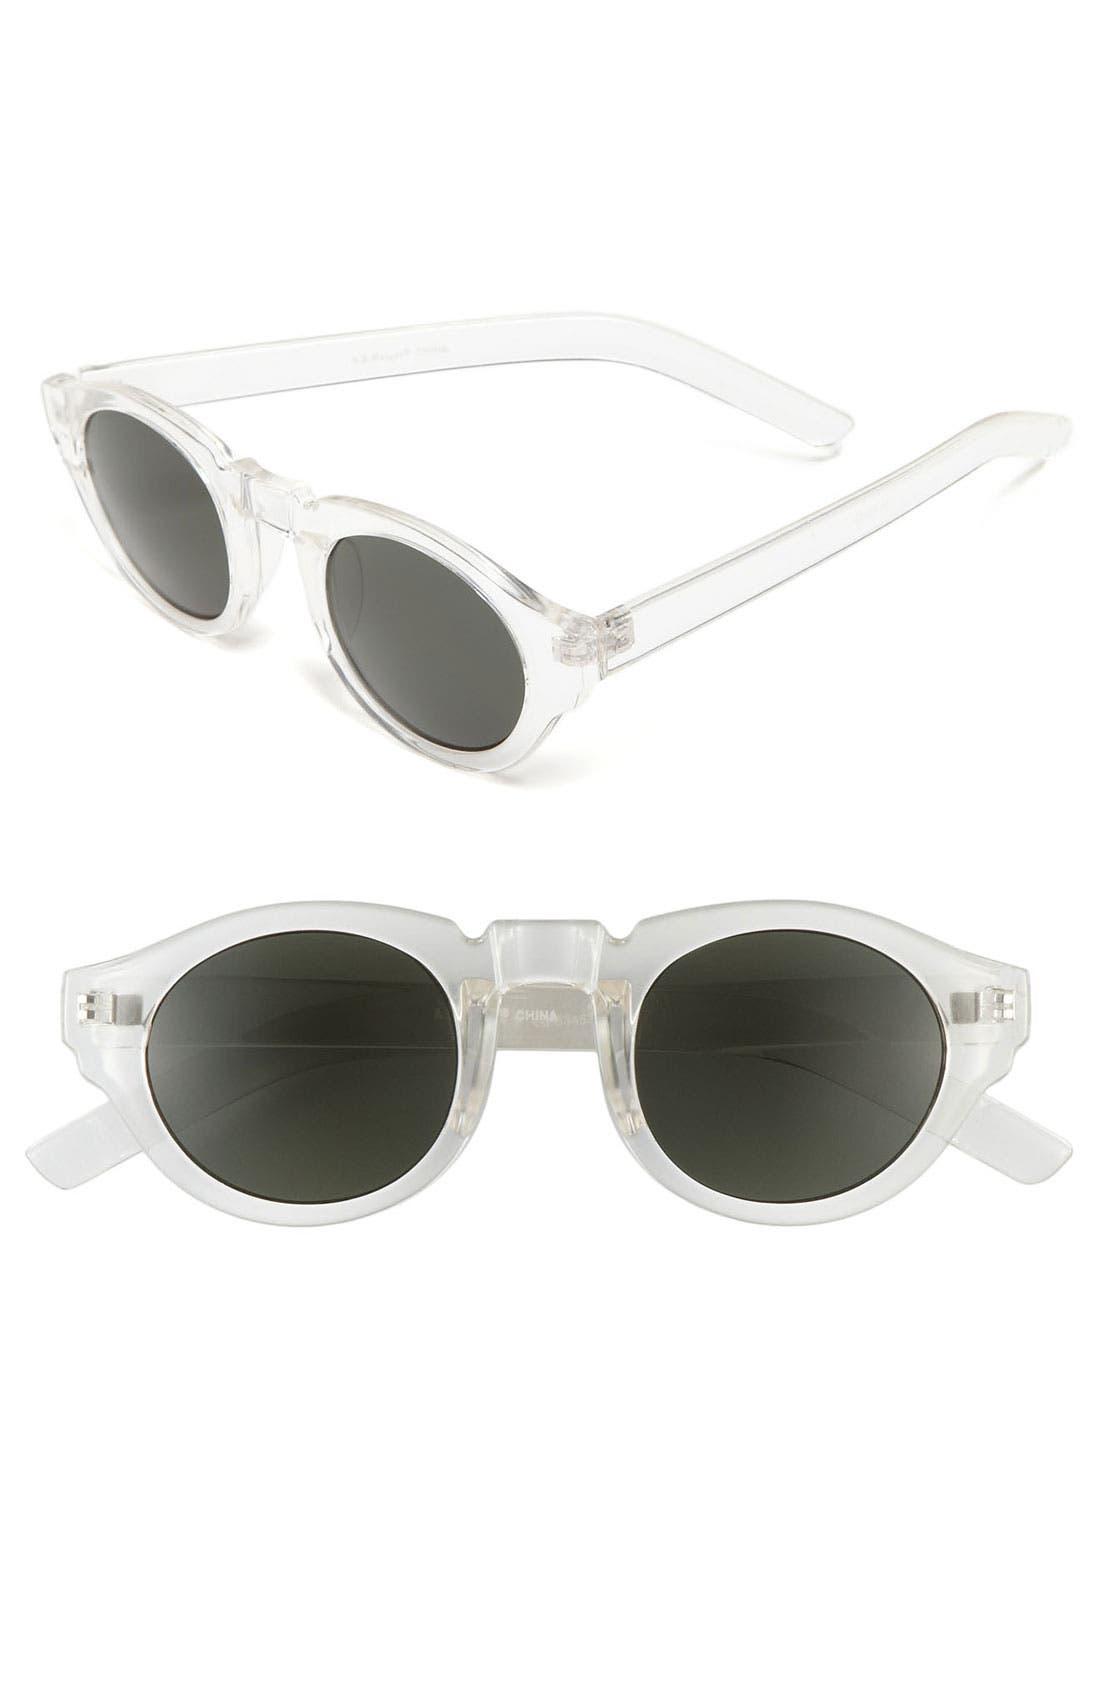 'Astro' Retro Sunglasses,                             Main thumbnail 1, color,                             Crystal